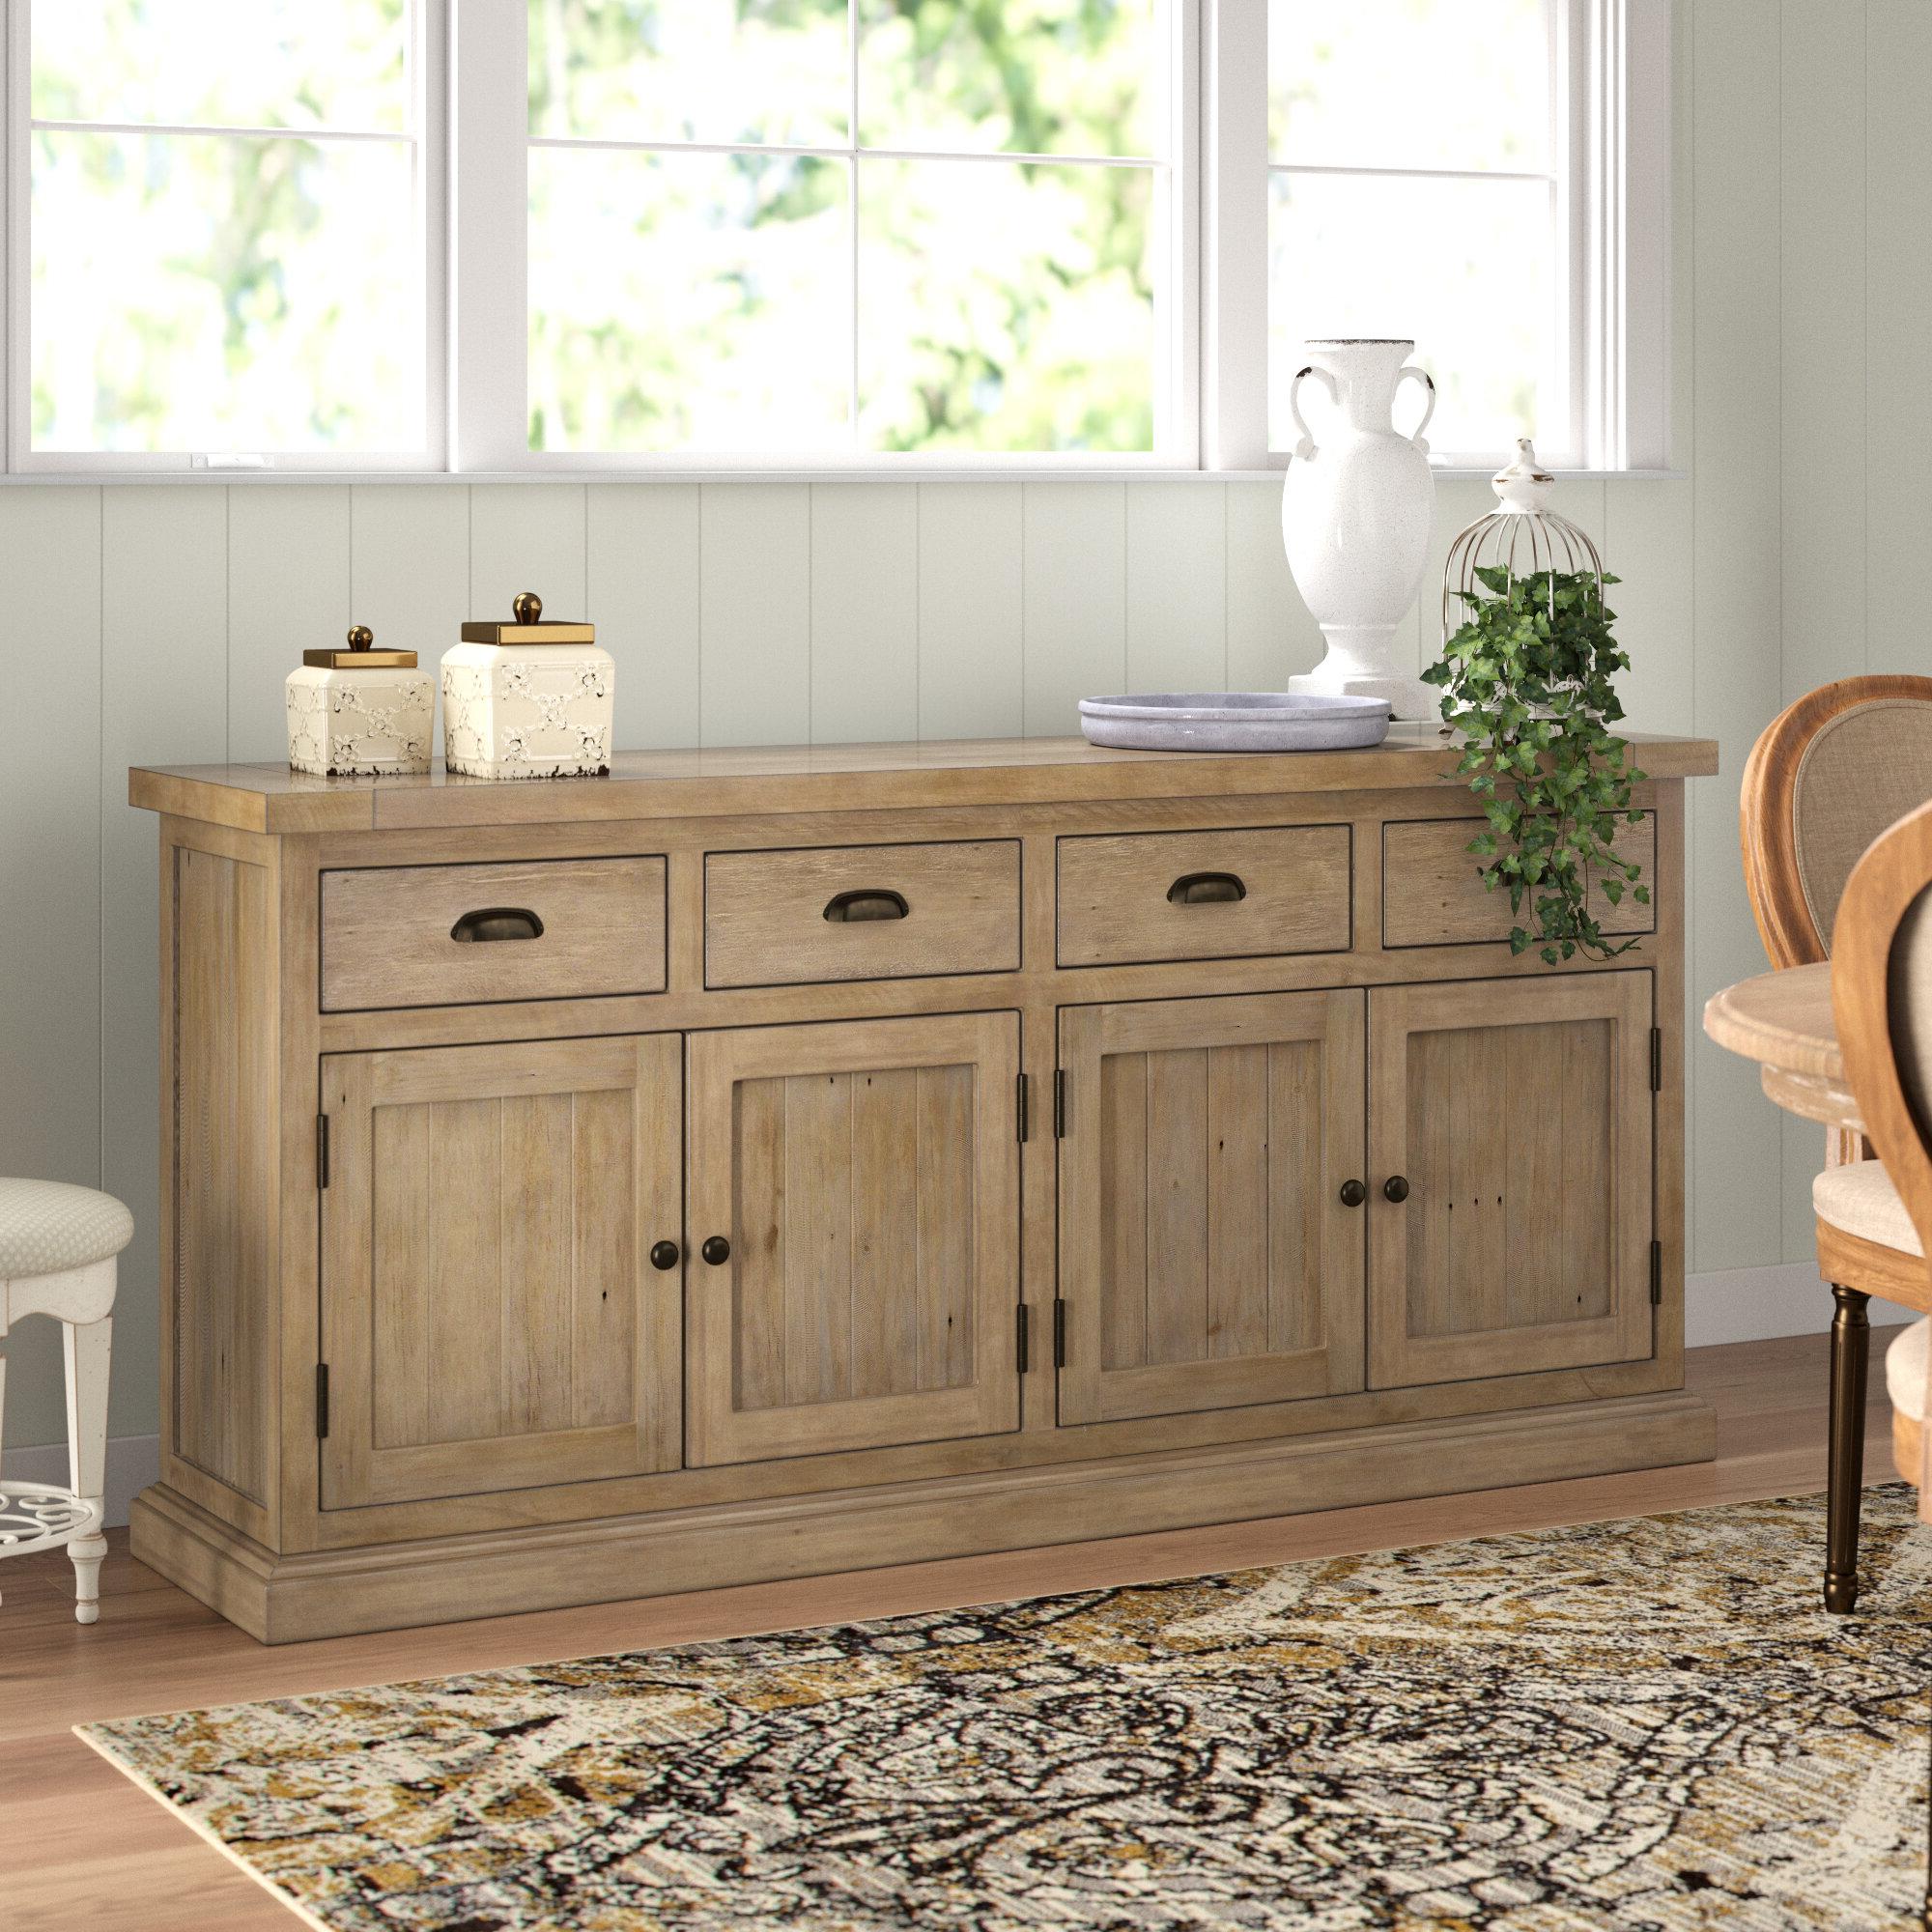 Lark Manor Gertrude Sideboard & Reviews | Wayfair For Gertrude Sideboards (View 3 of 20)